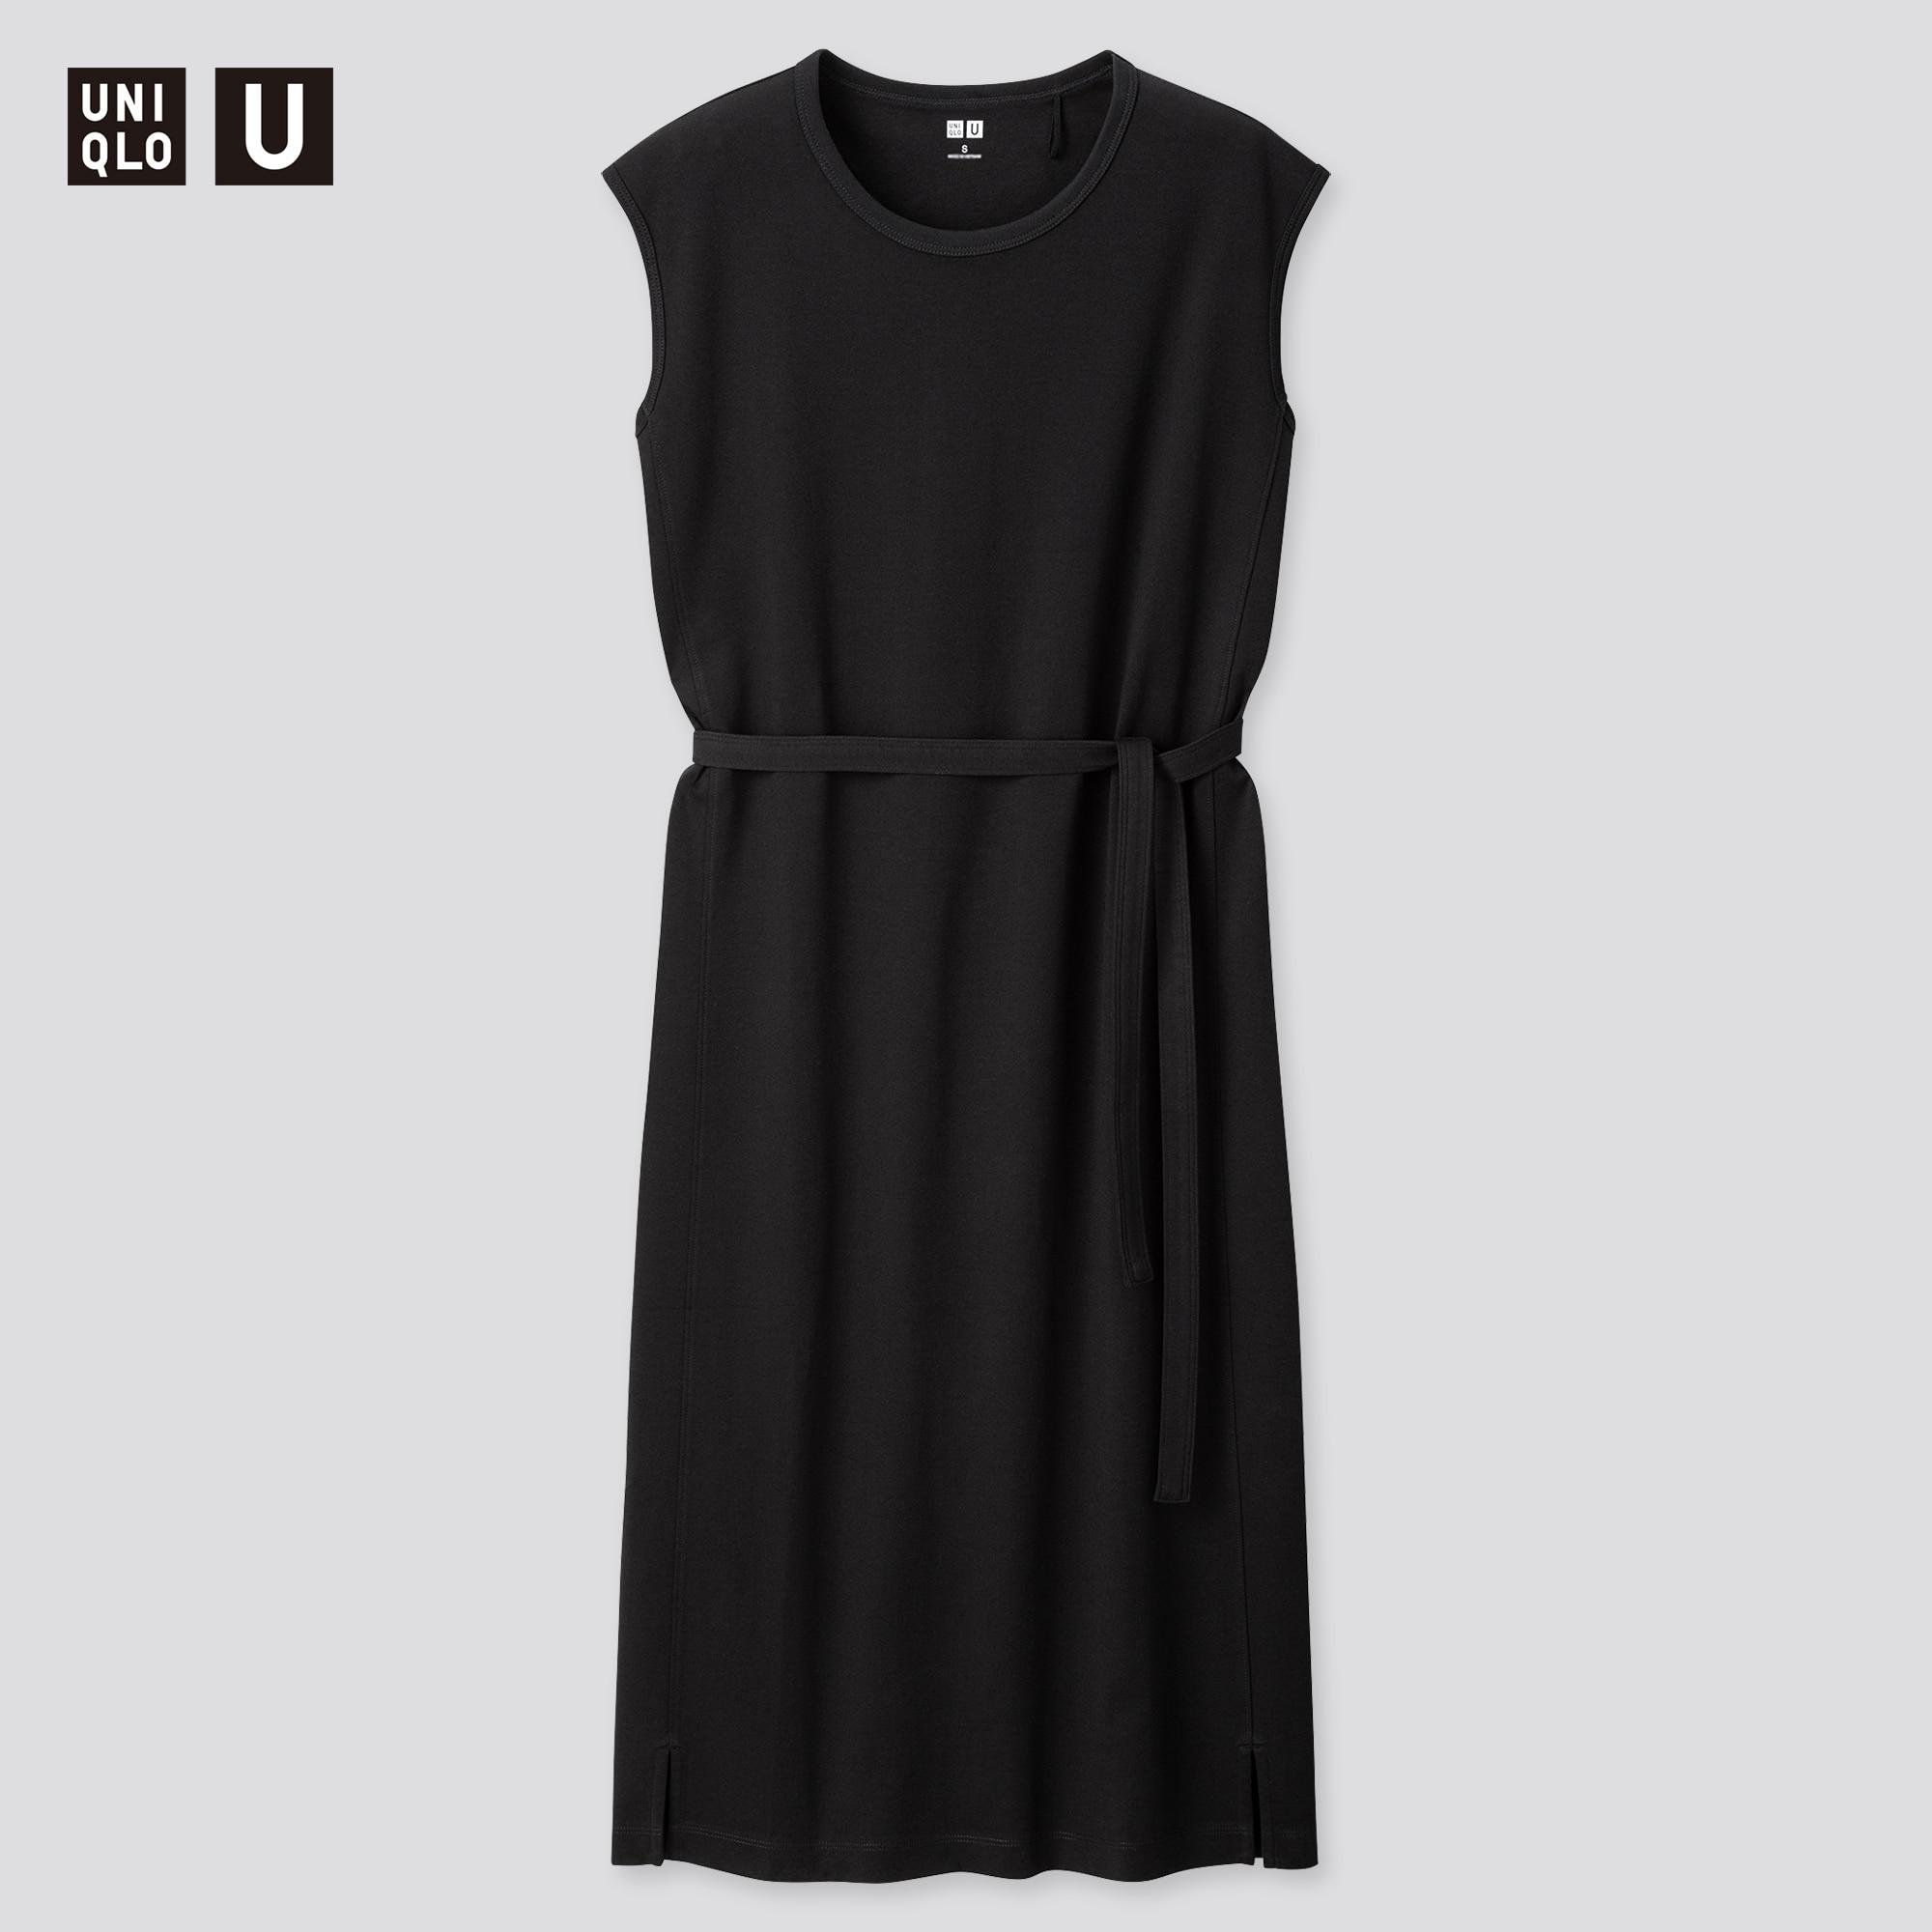 Women Uniqlo U Crew Neck Sleeveless Dress